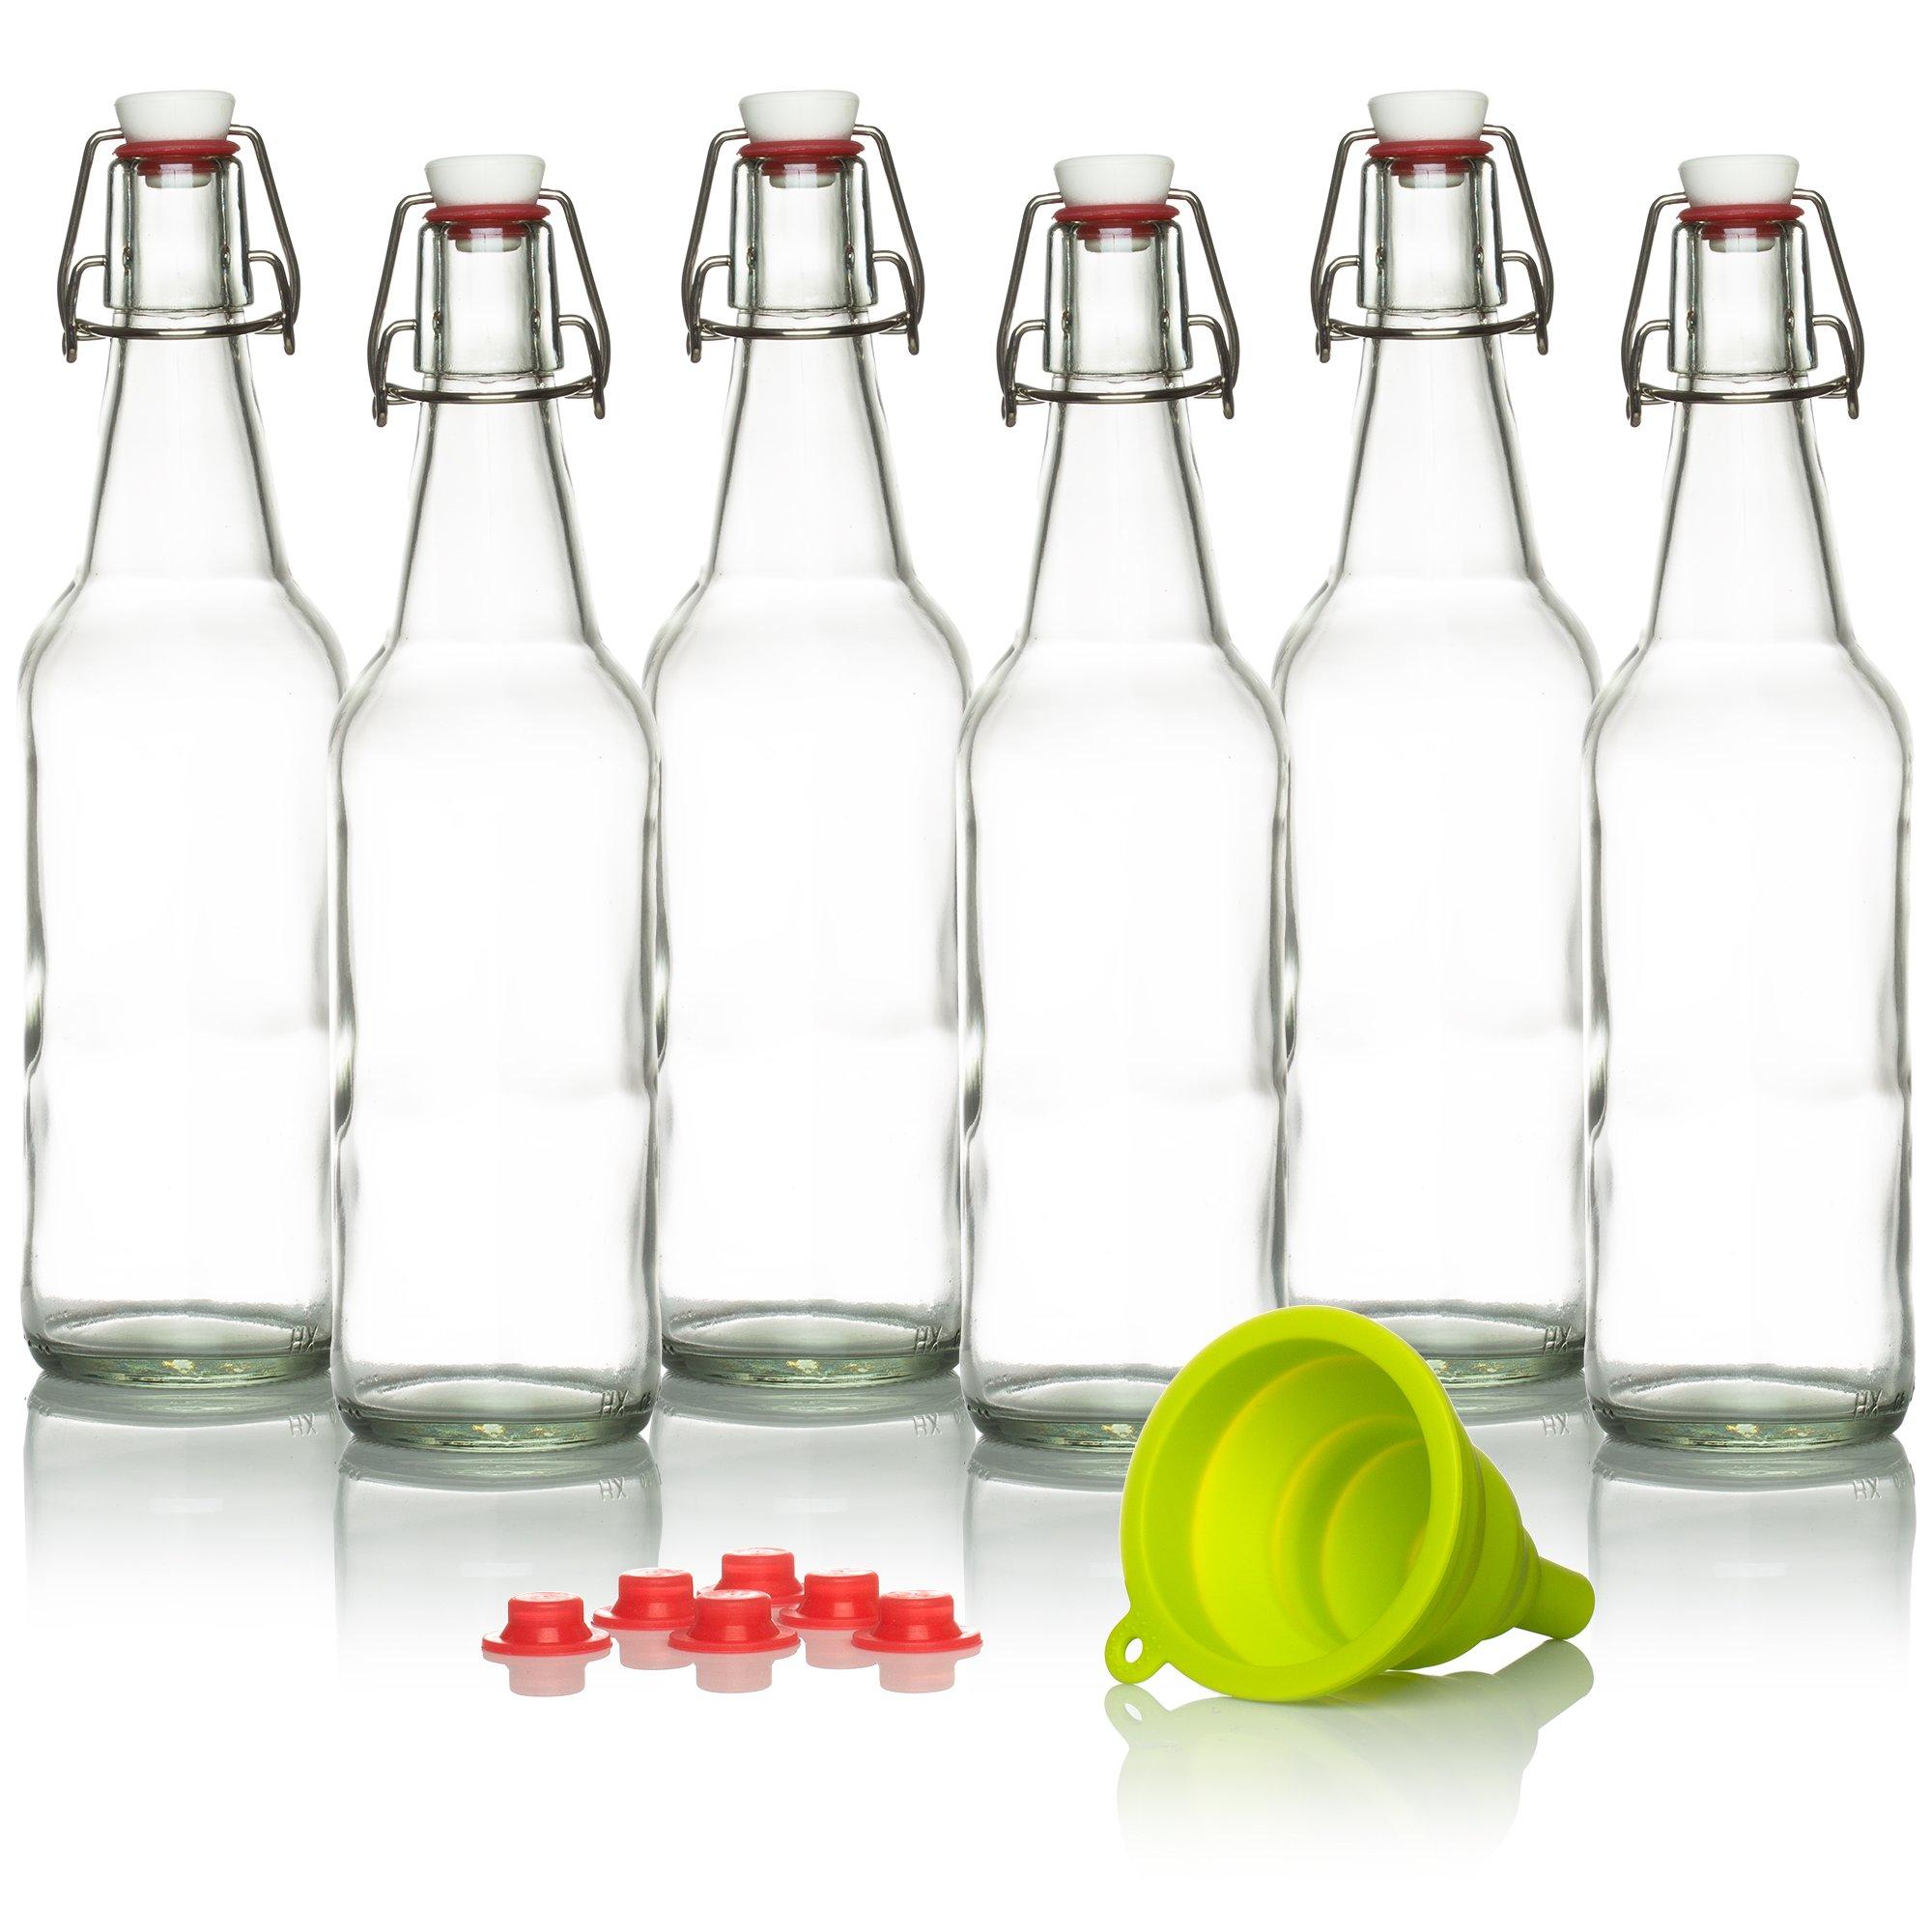 Swing Top Glass Bottles Brewing Bottles For Kombucha, Beer, Kiefer - 16 oz. - Grolsch Style Bottle (6 set) with Funnel by Hemlock Home Brewing